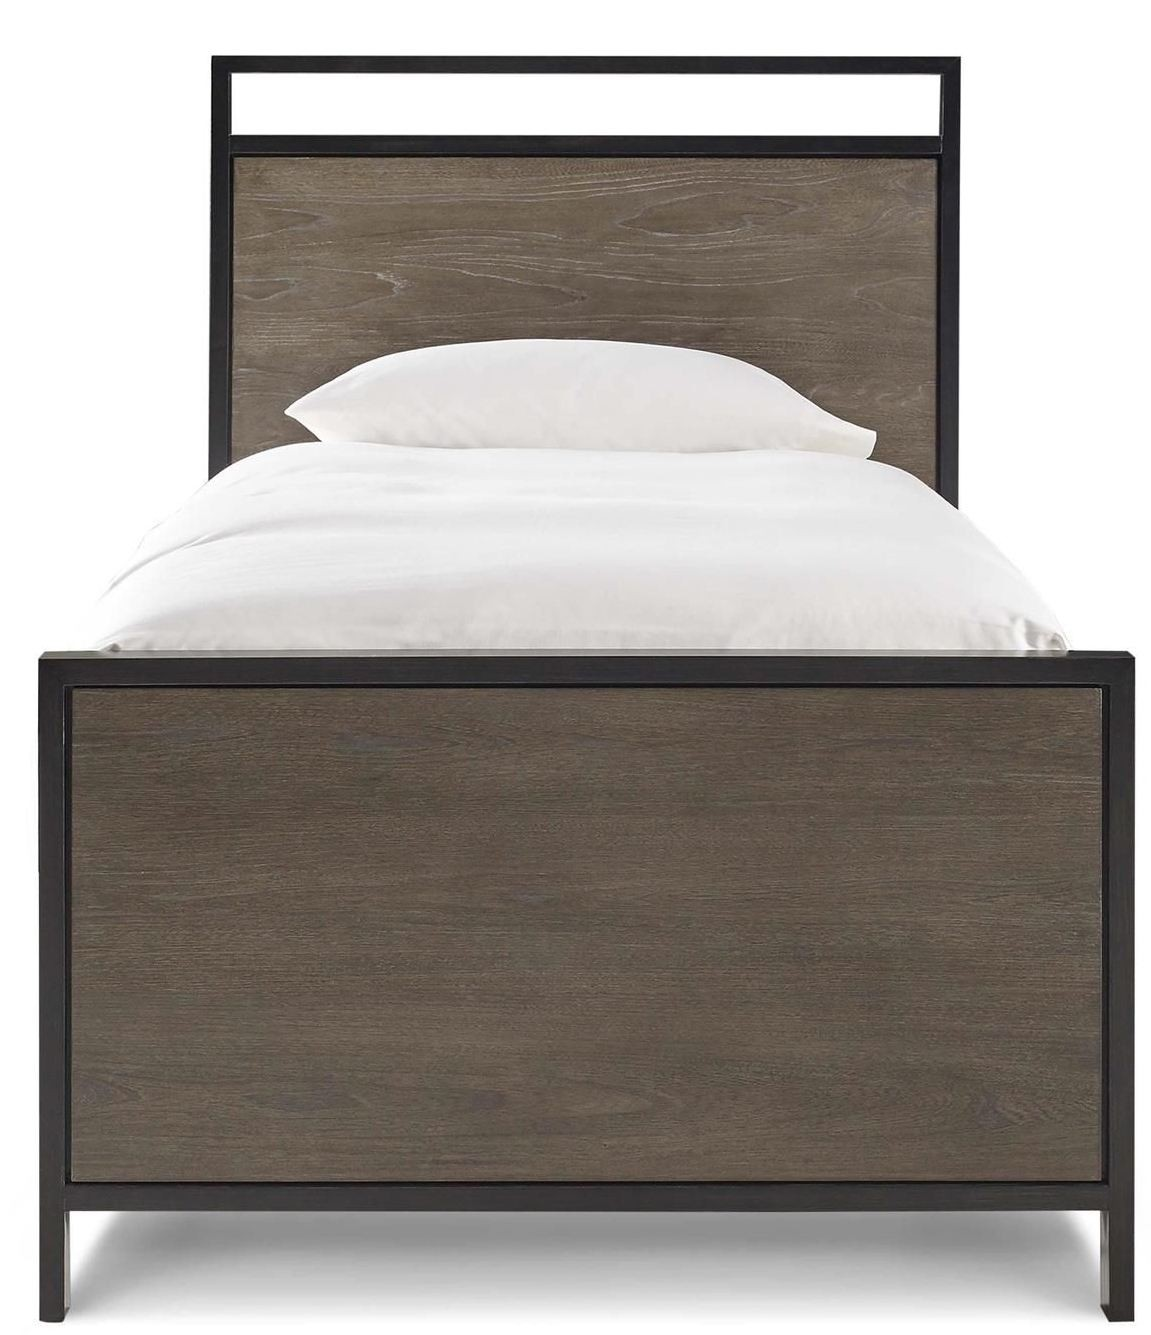 Myroom Chalkboard and Backpack Twin Panel Bed